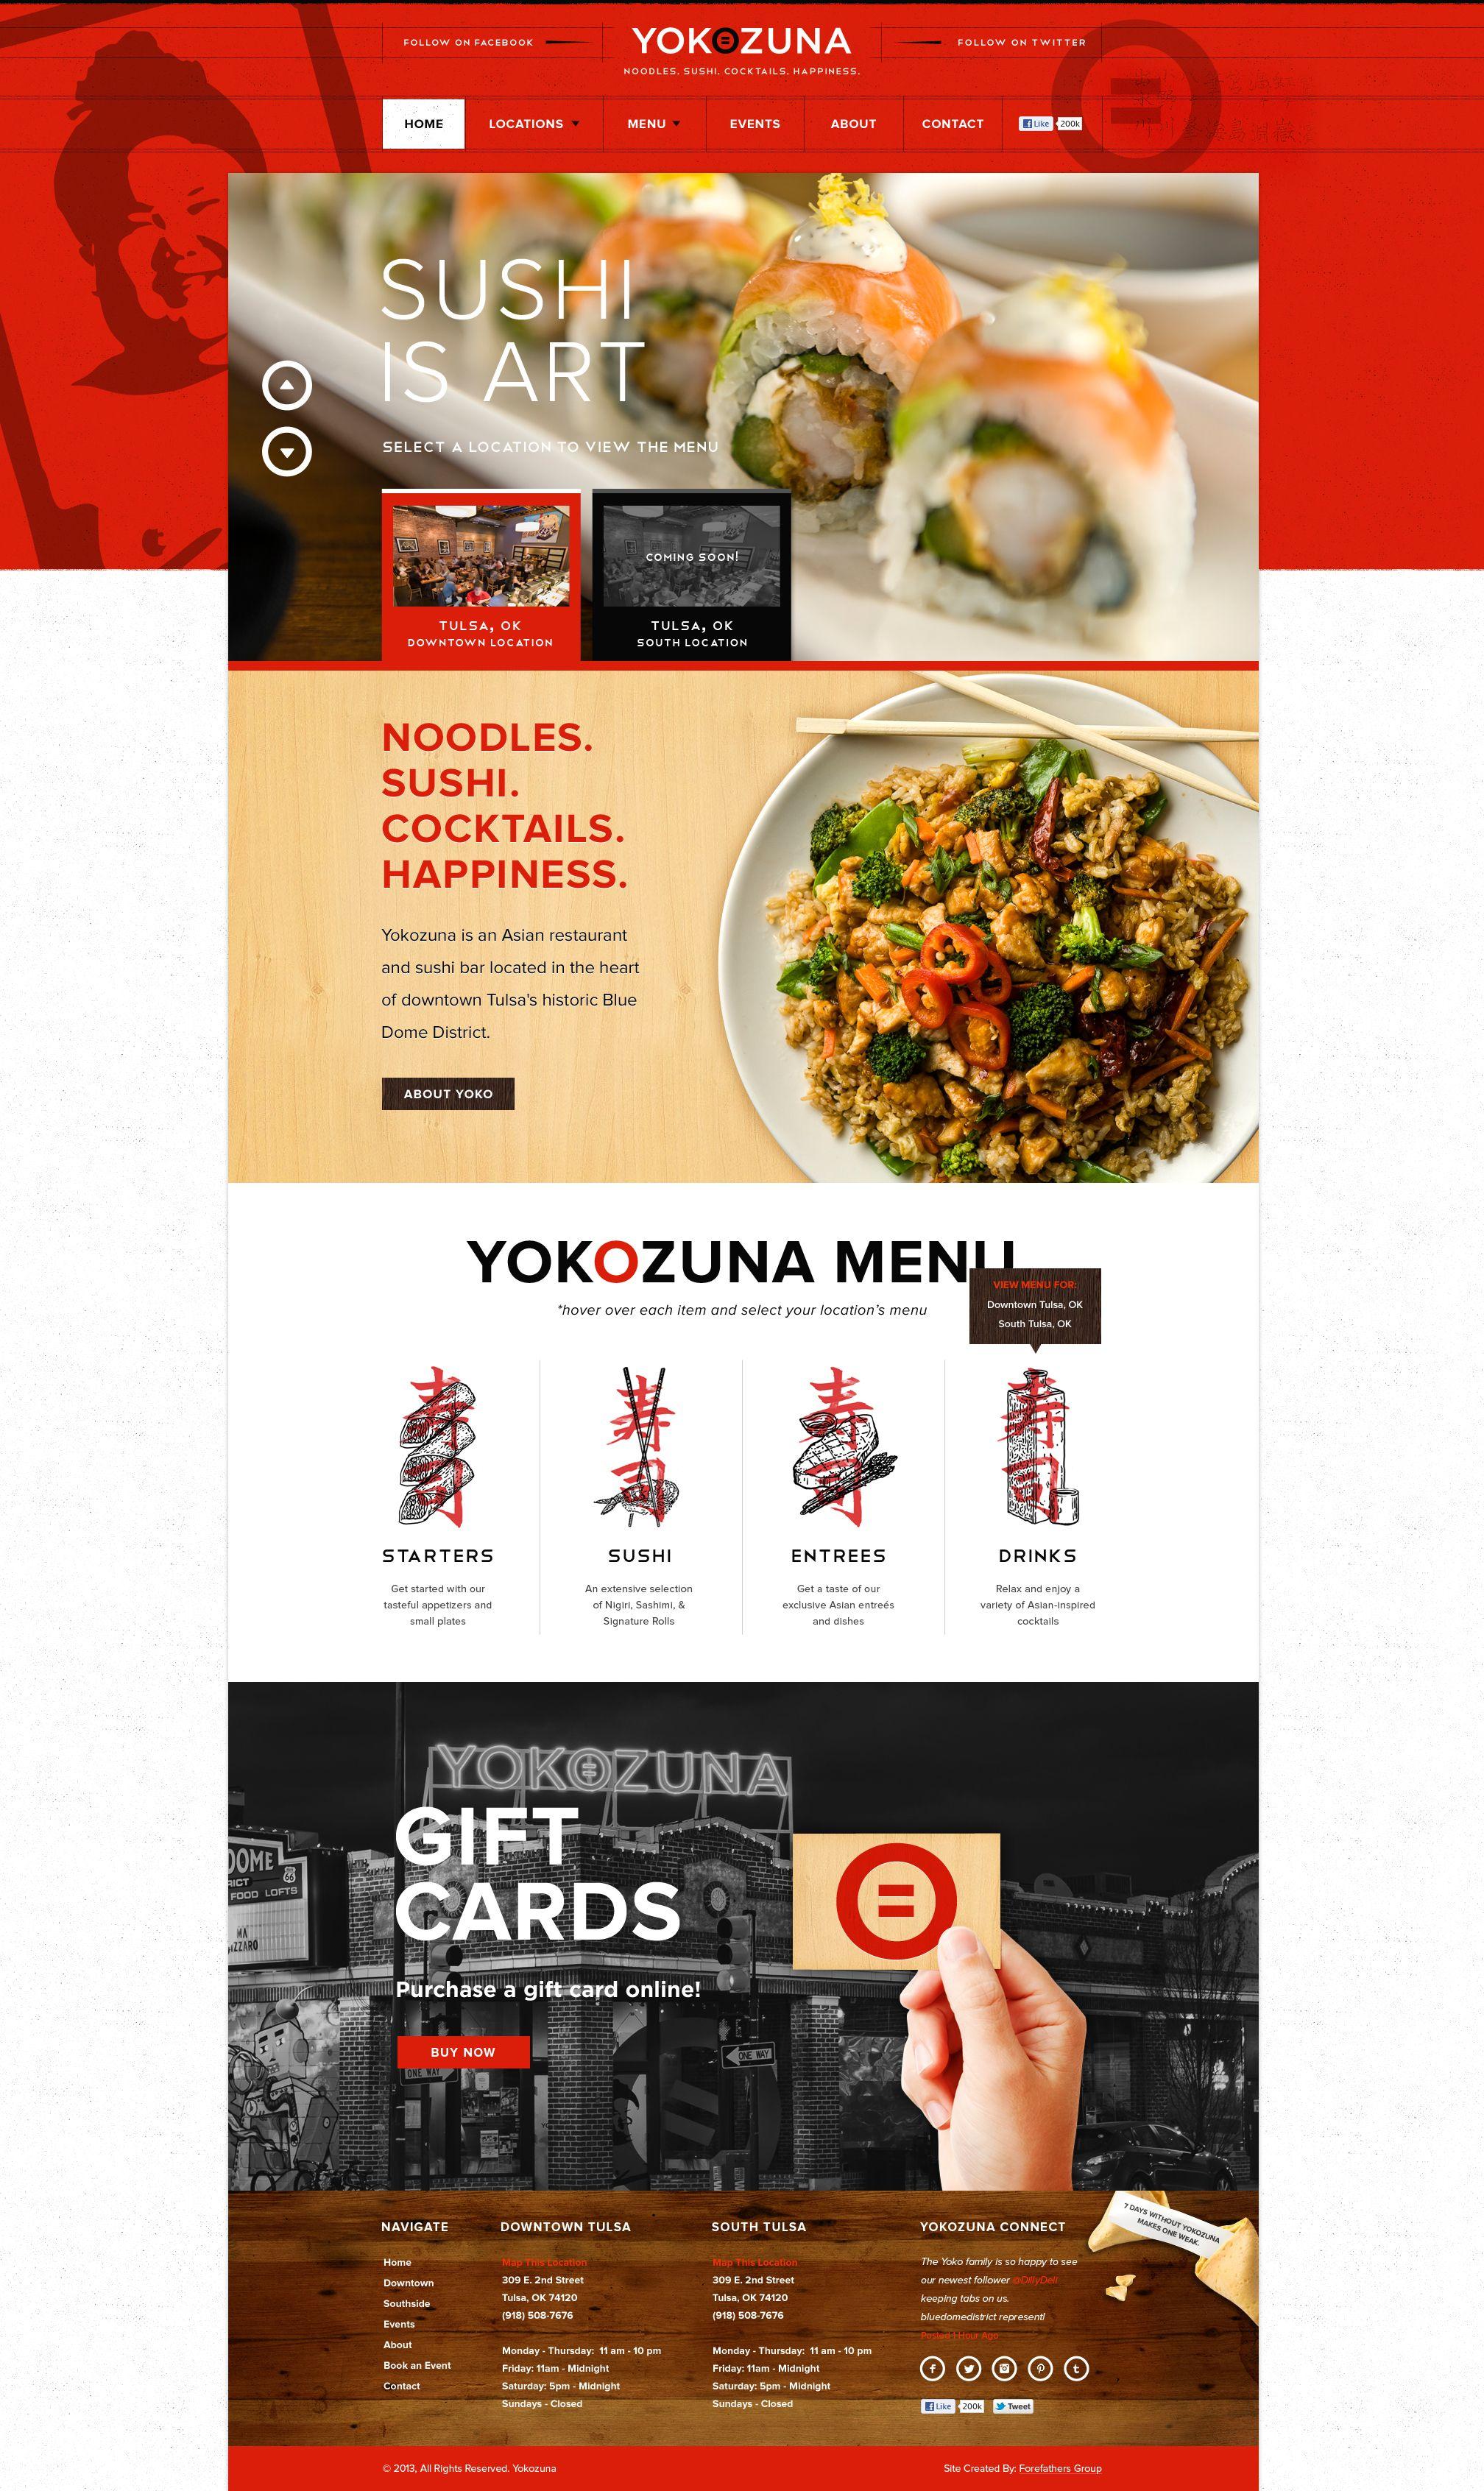 Yokozuna Tulsa Ok Bar Asian Fusion Restaurant Food Web Design Web Development Design Unique Web Design